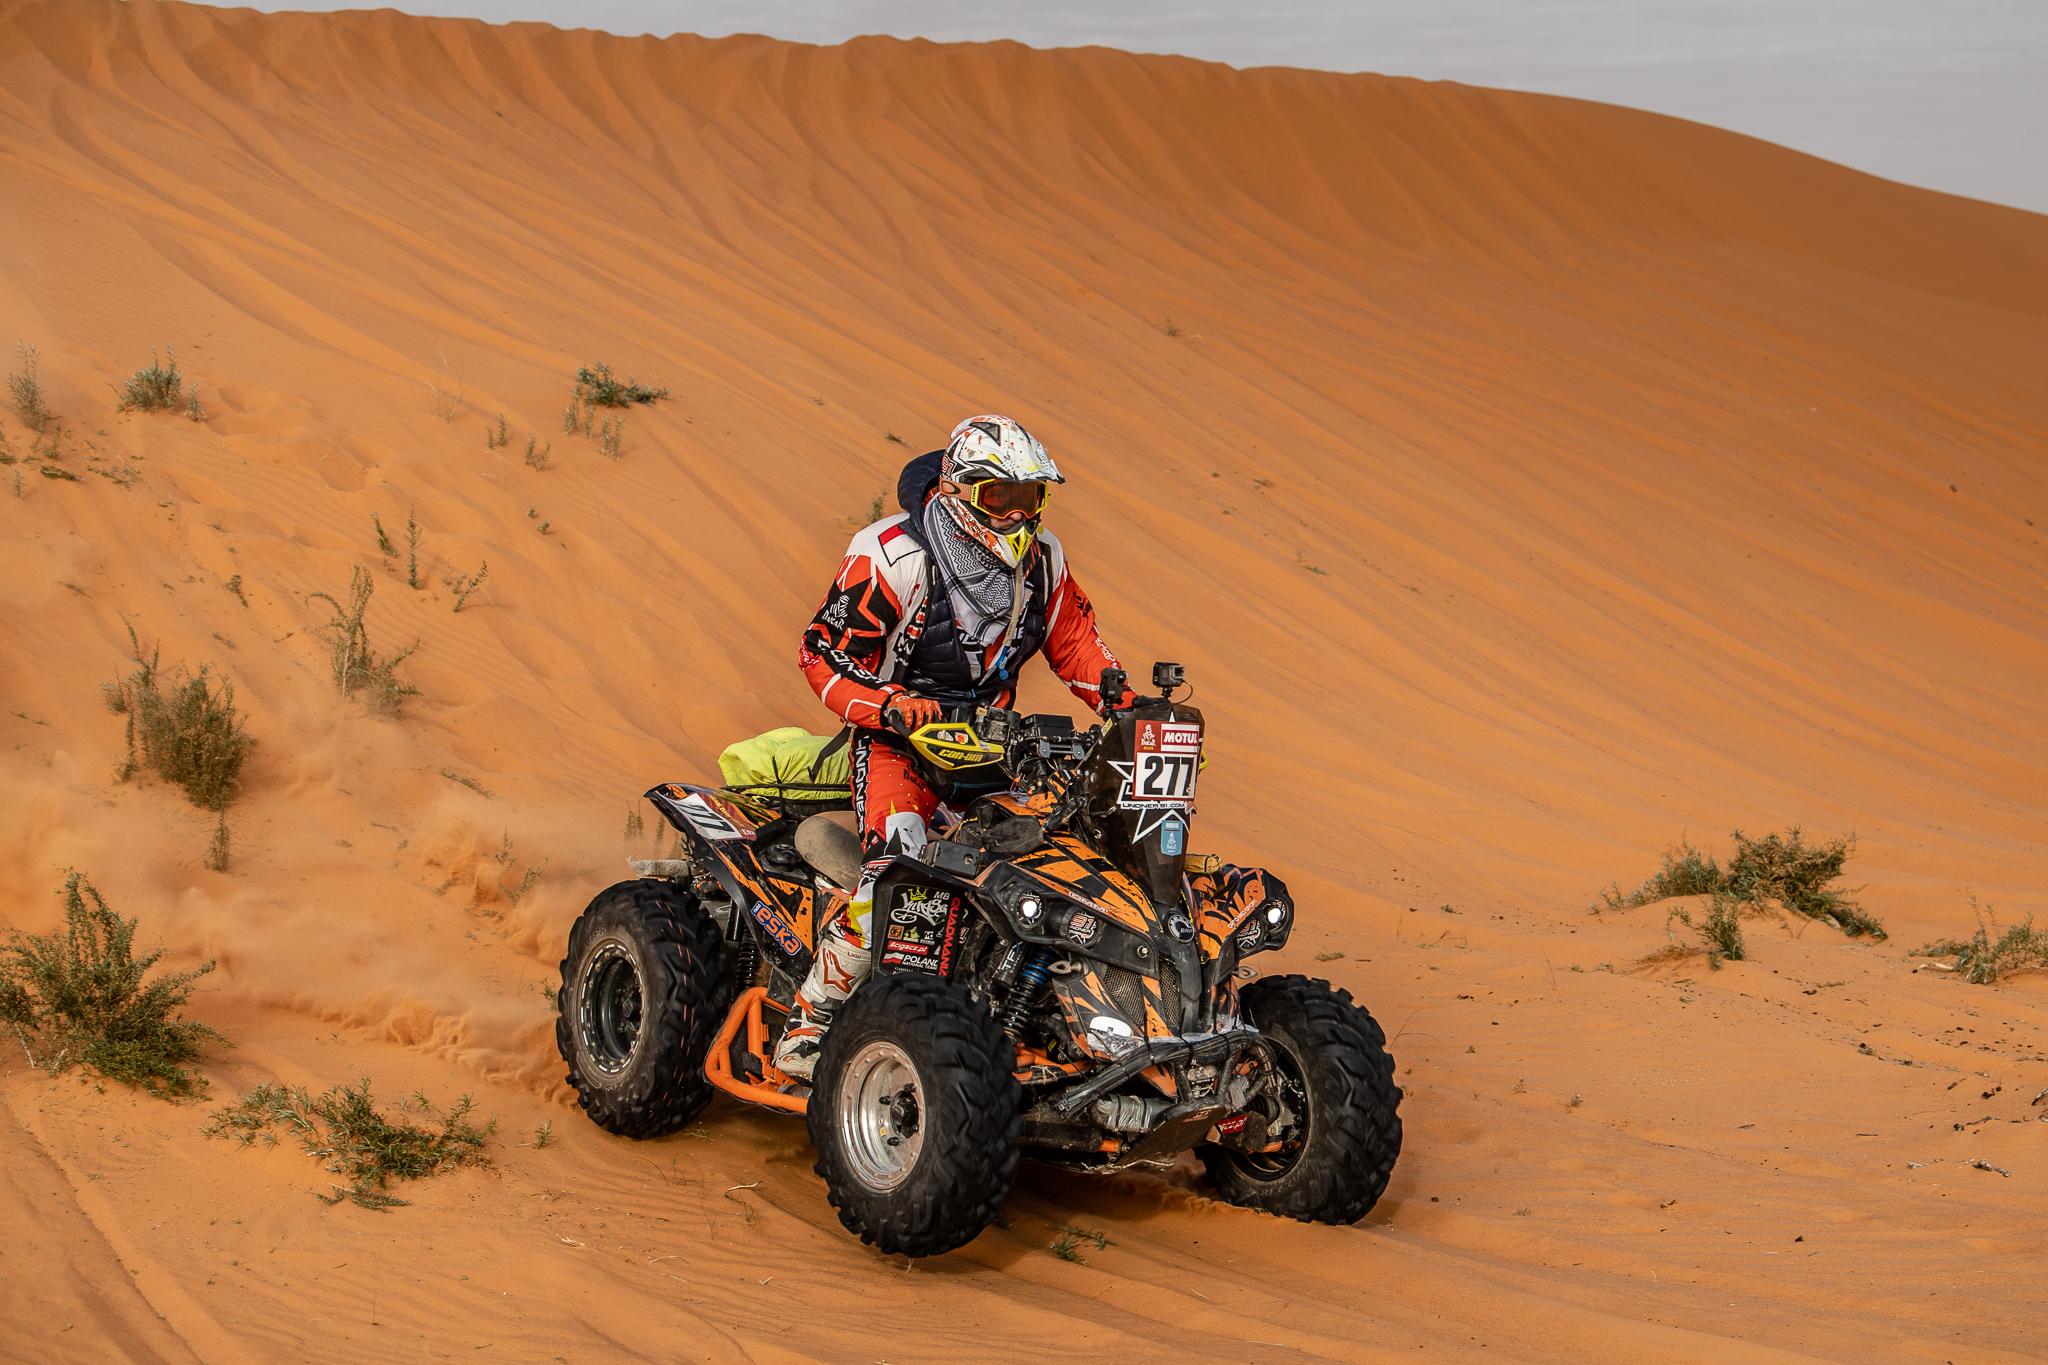 Dakar_2020_Lindner_stage_6_M130408